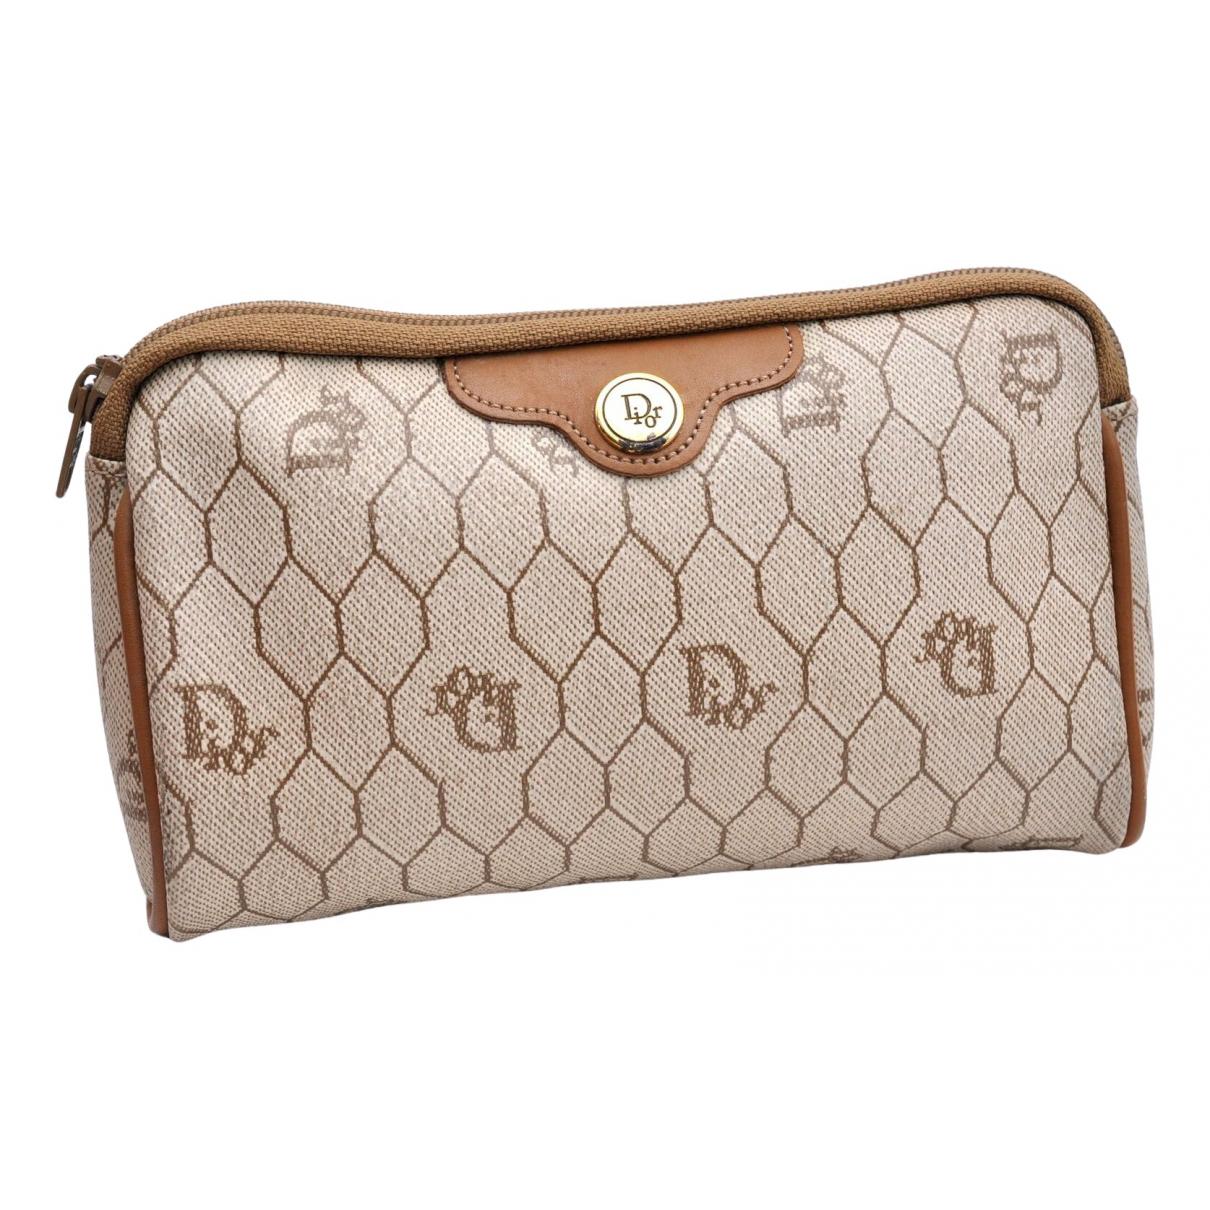 Dior \N Beige Leather Clutch bag for Women \N